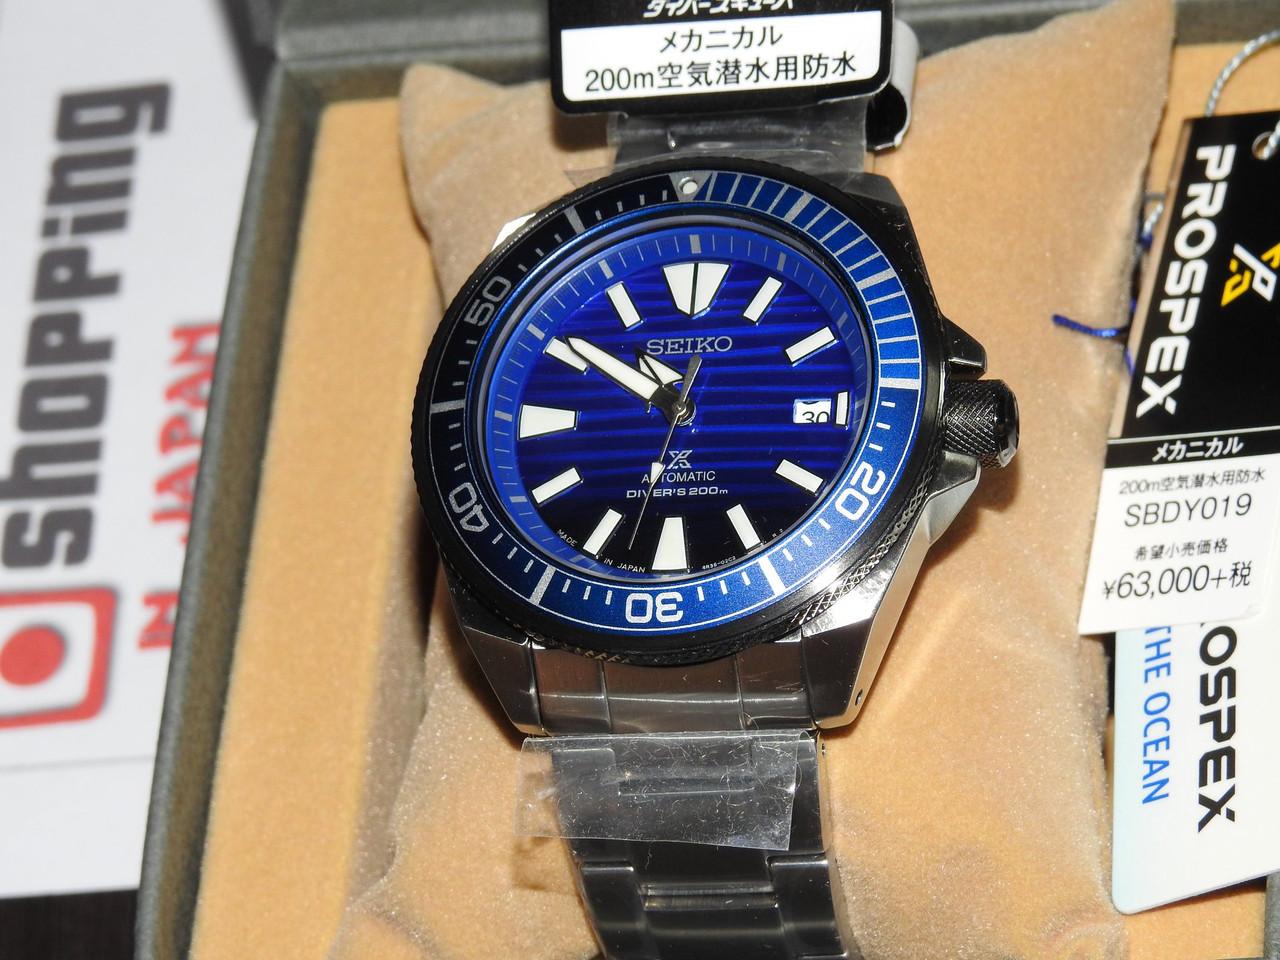 Seiko Samurai Save the Ocean SBDY019 Made In Japan